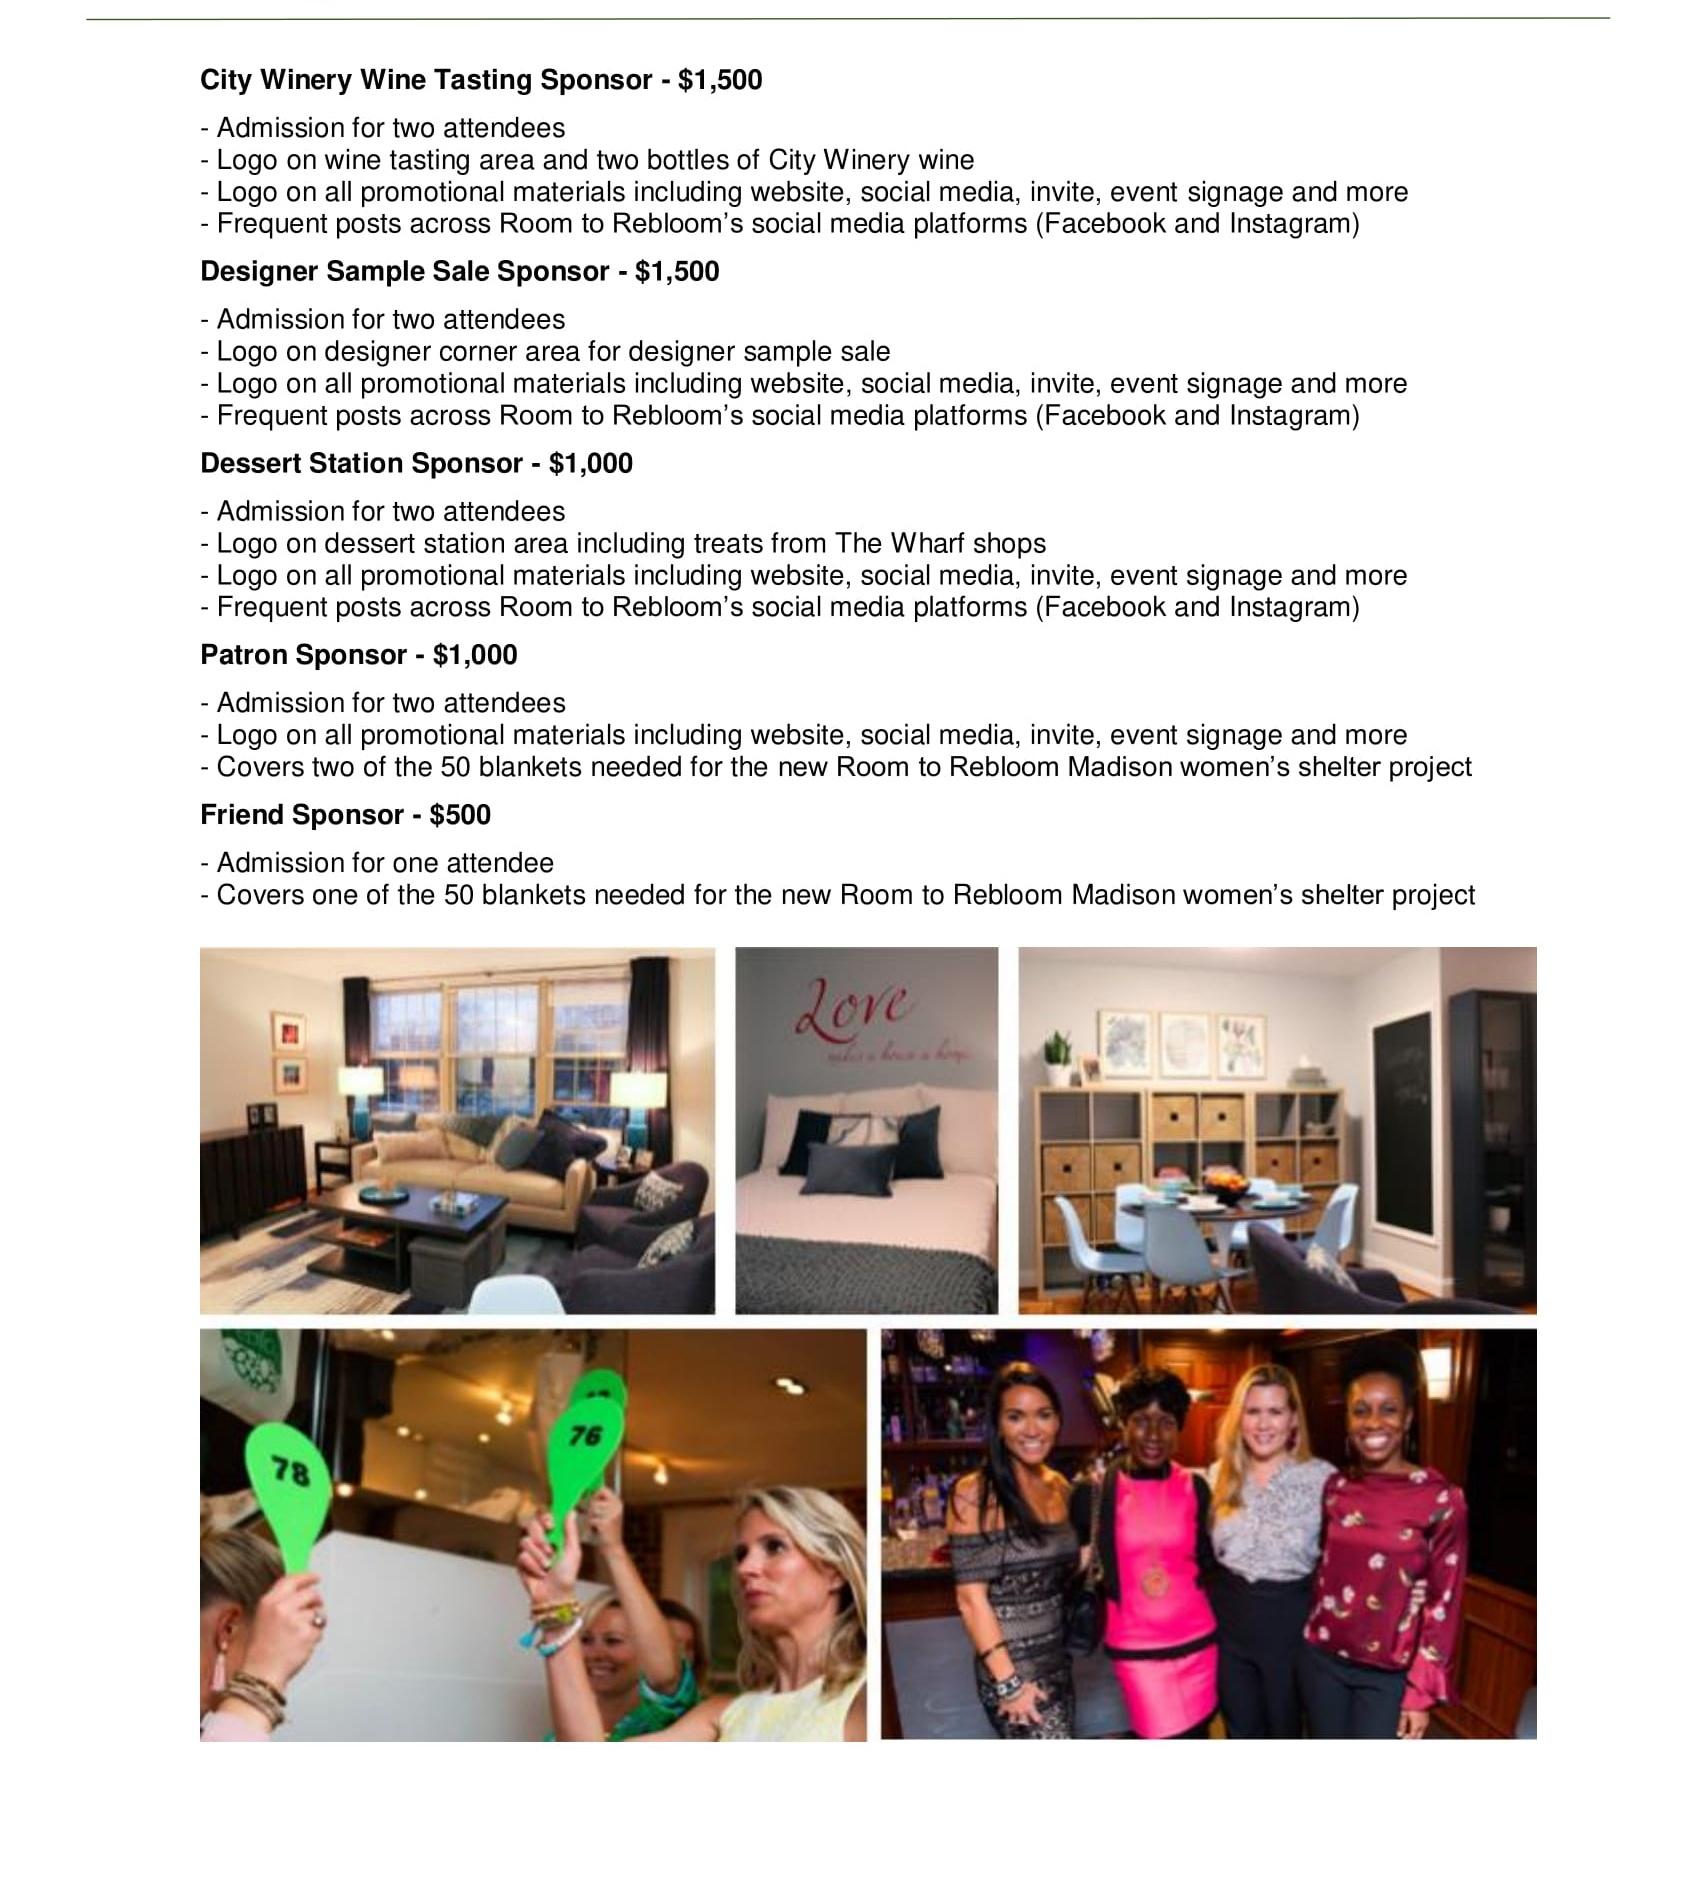 _Room+To+Rebloom_2019+Sponsorship+Opportunities_03.05.2019-2.jpg